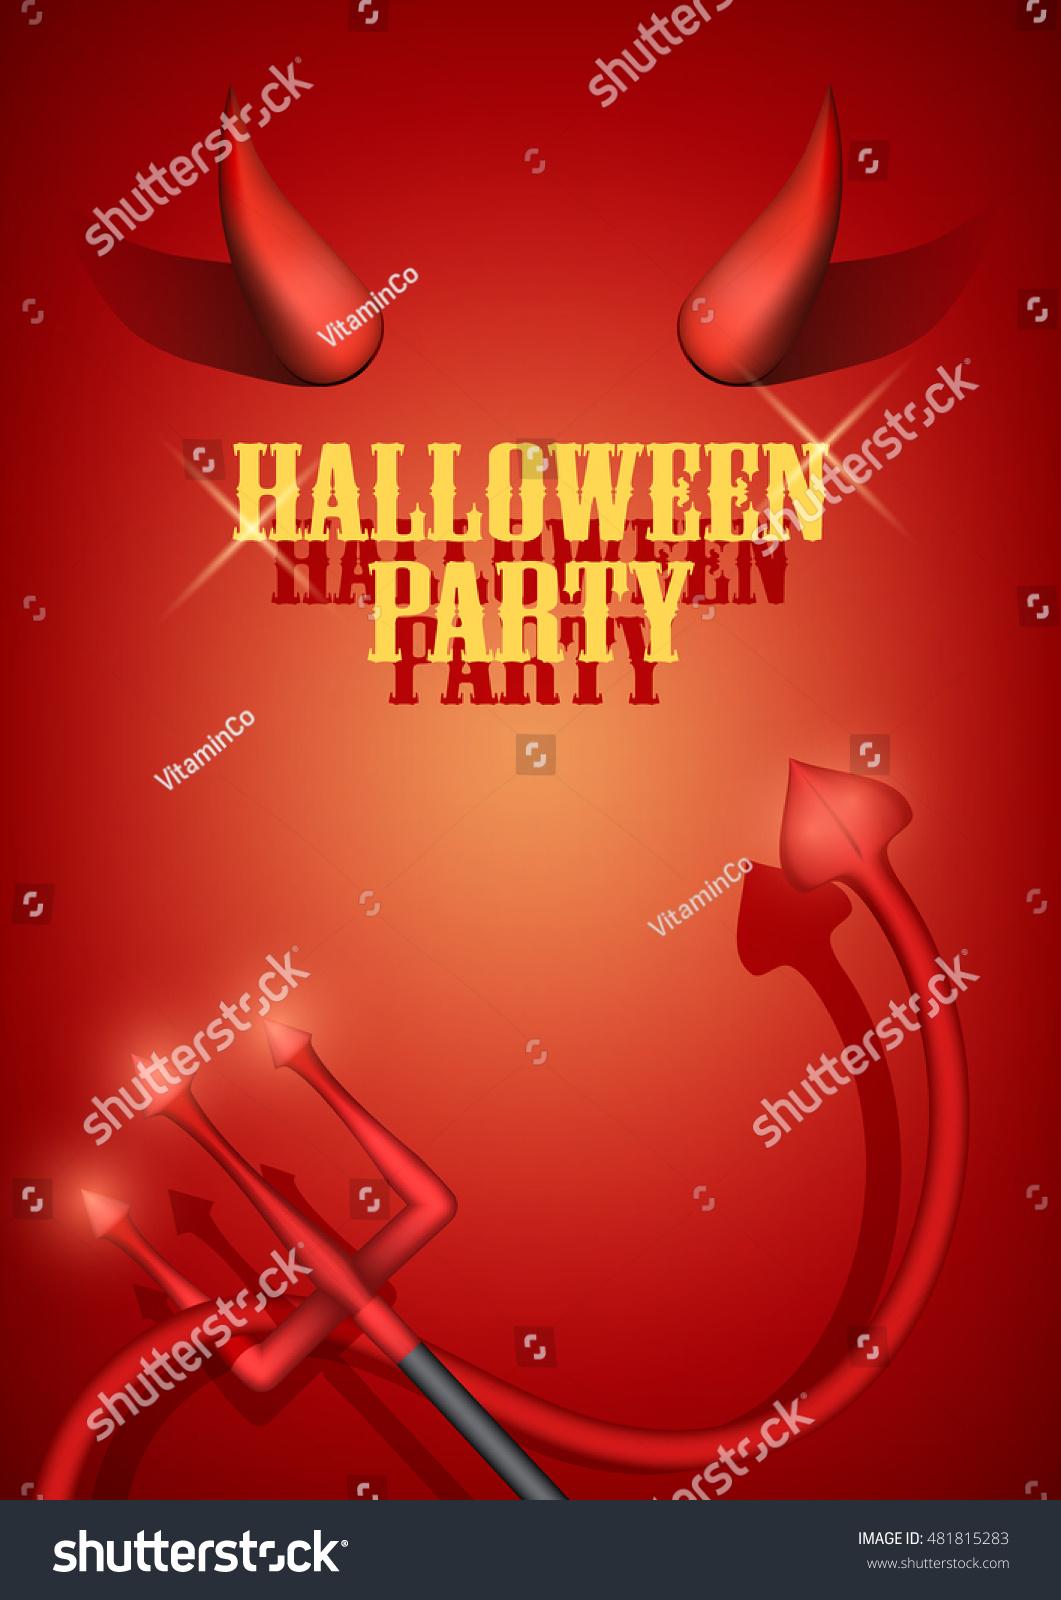 Halloween Party Invitation Devil Horns Tail Stock Vector (Royalty ...